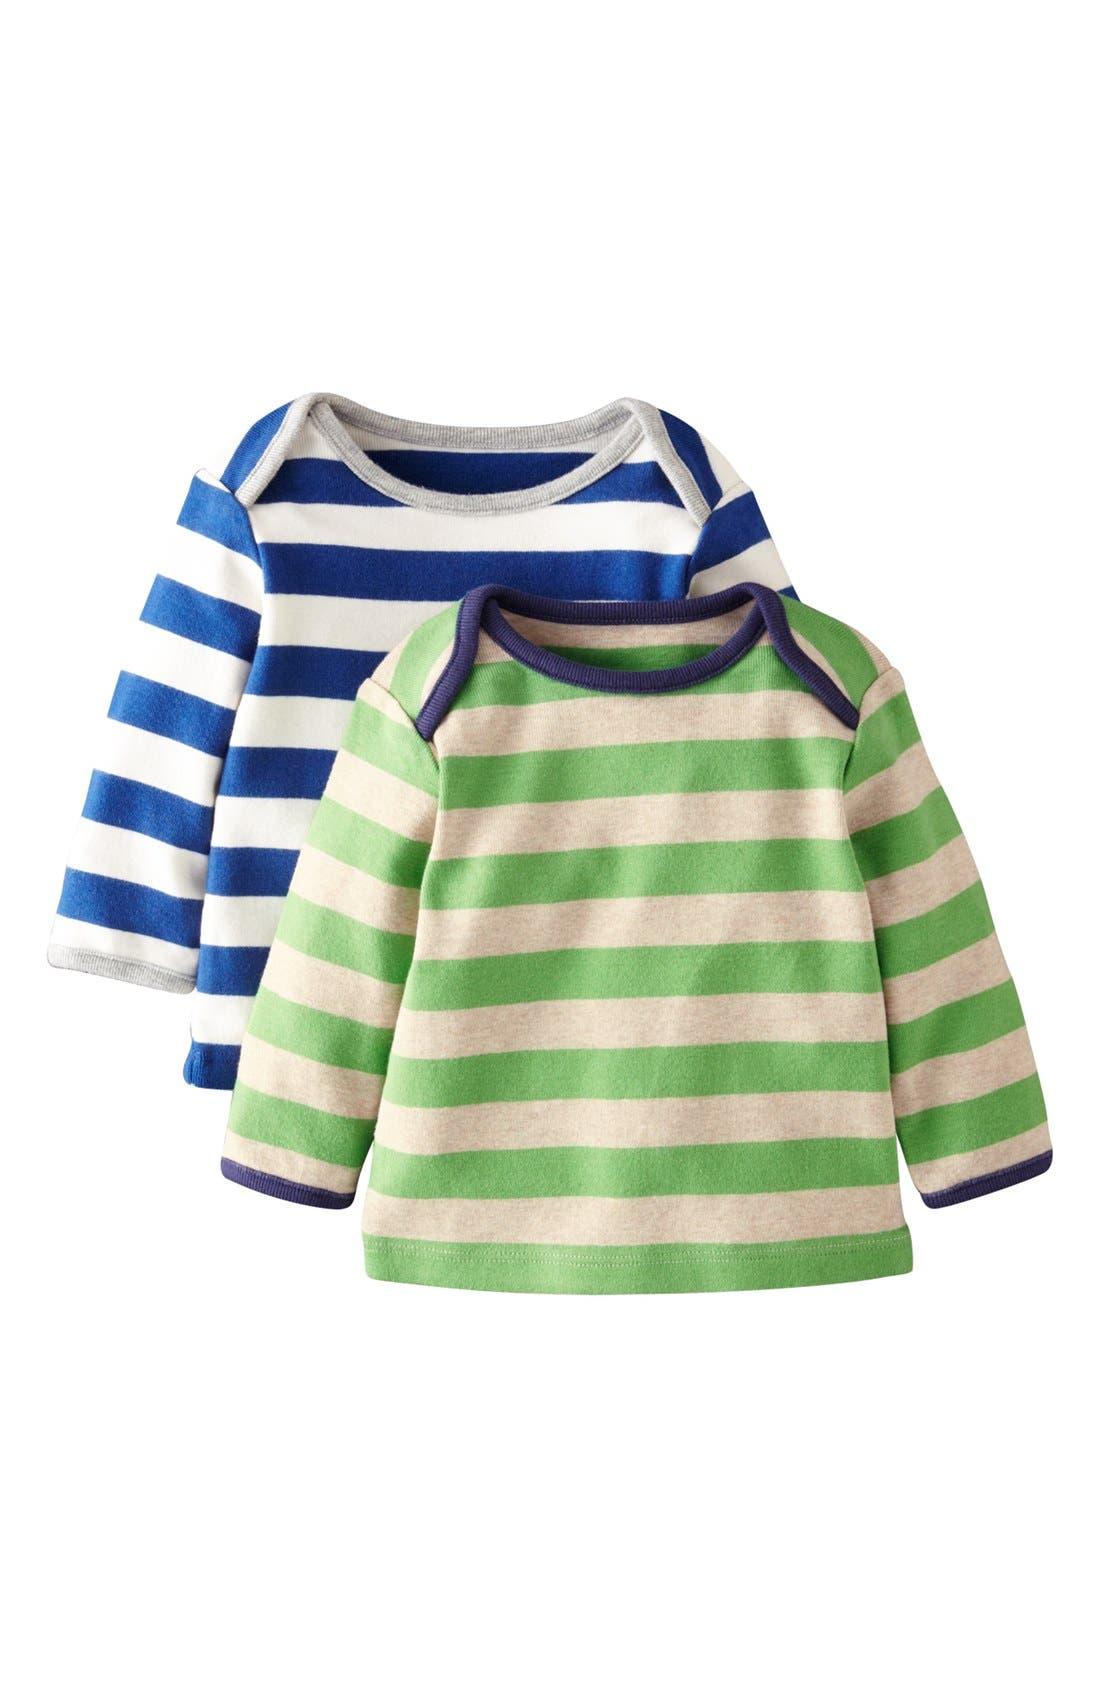 Main Image - 'Stripy' T-Shirt (2-Pack) (Baby Boys)